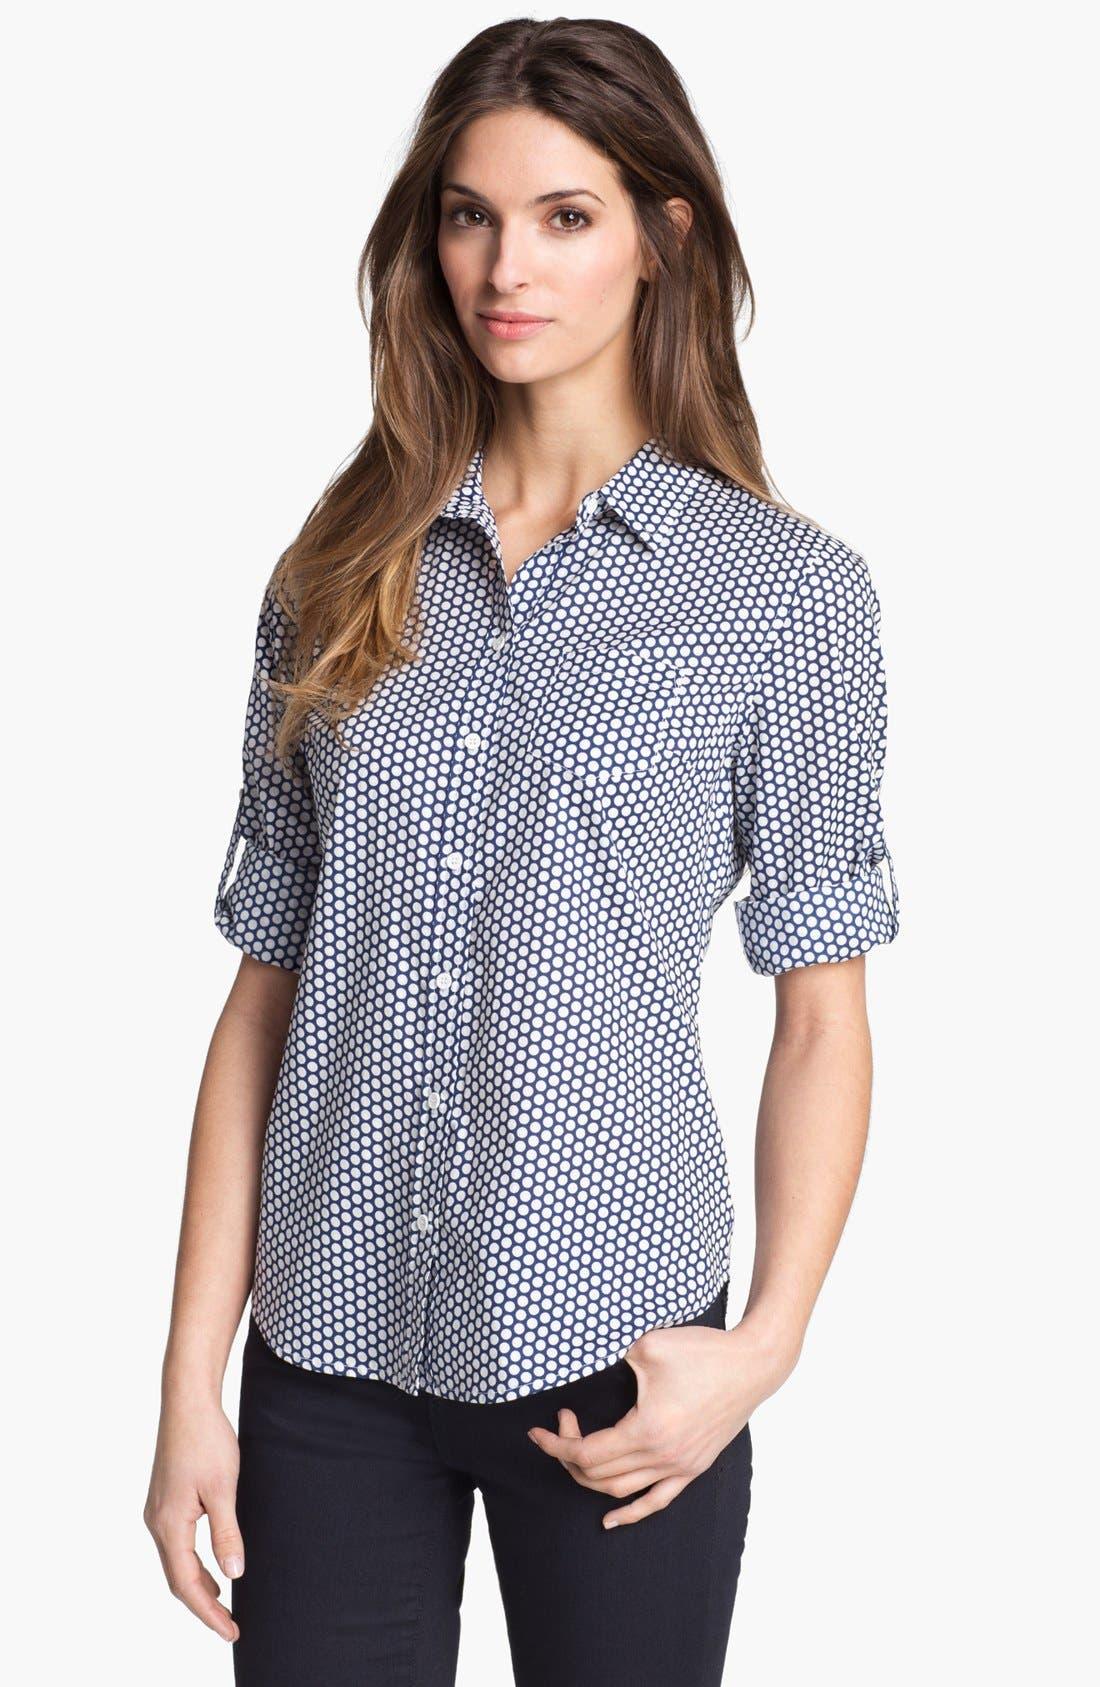 Alternate Image 1 Selected - Sandra Ingrish Roll Sleeve Polka Dot Shirt (Petite)